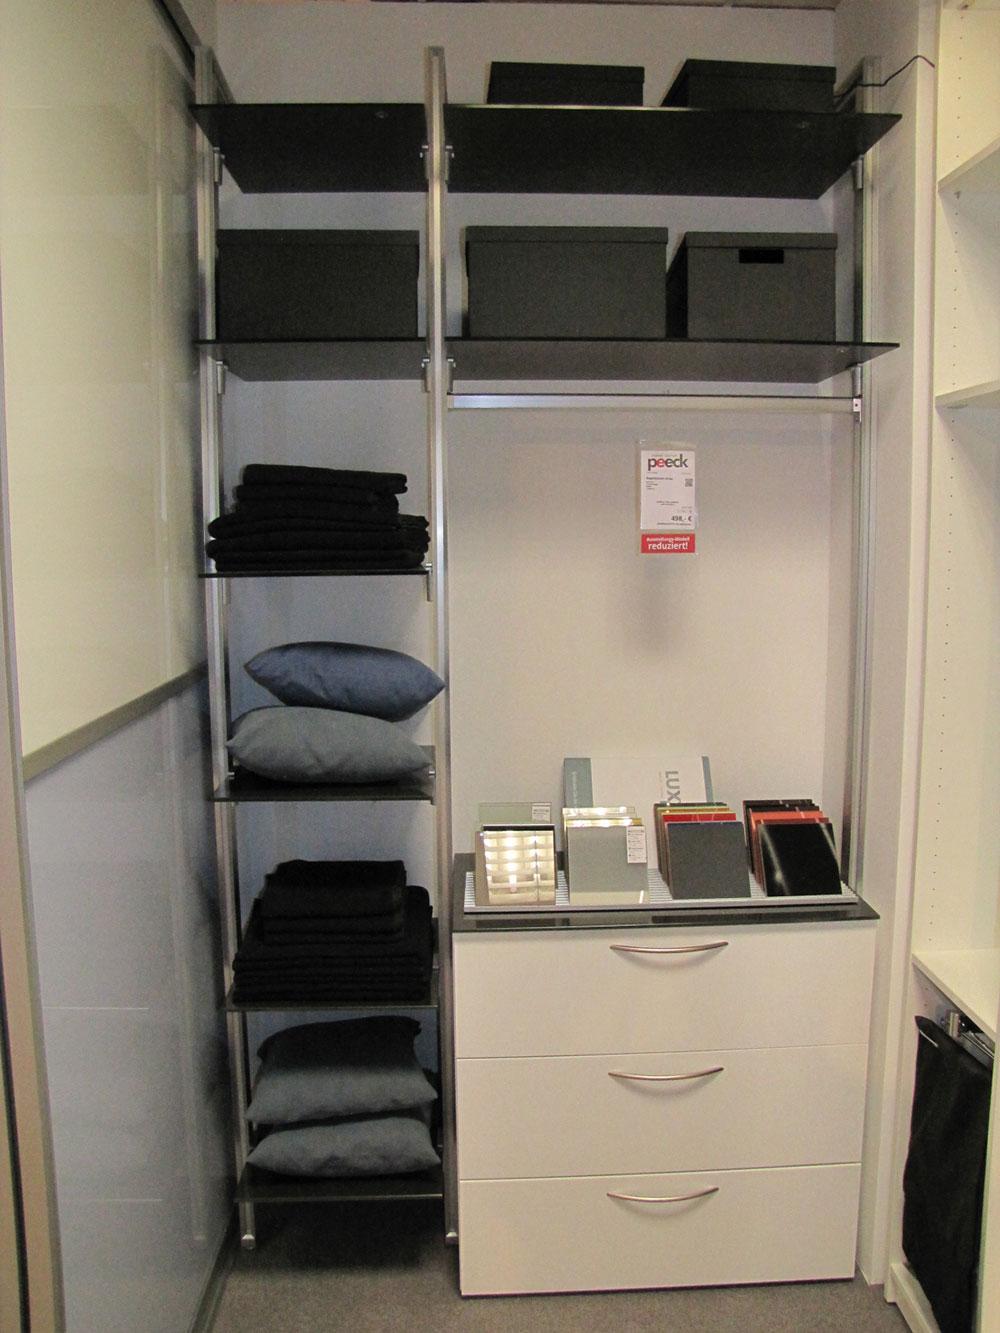 Full Size of Nolte Apothekerschrank Regalsystem Arias Mbel Peeck Kchen Betten Küche Schlafzimmer Wohnzimmer Nolte Apothekerschrank